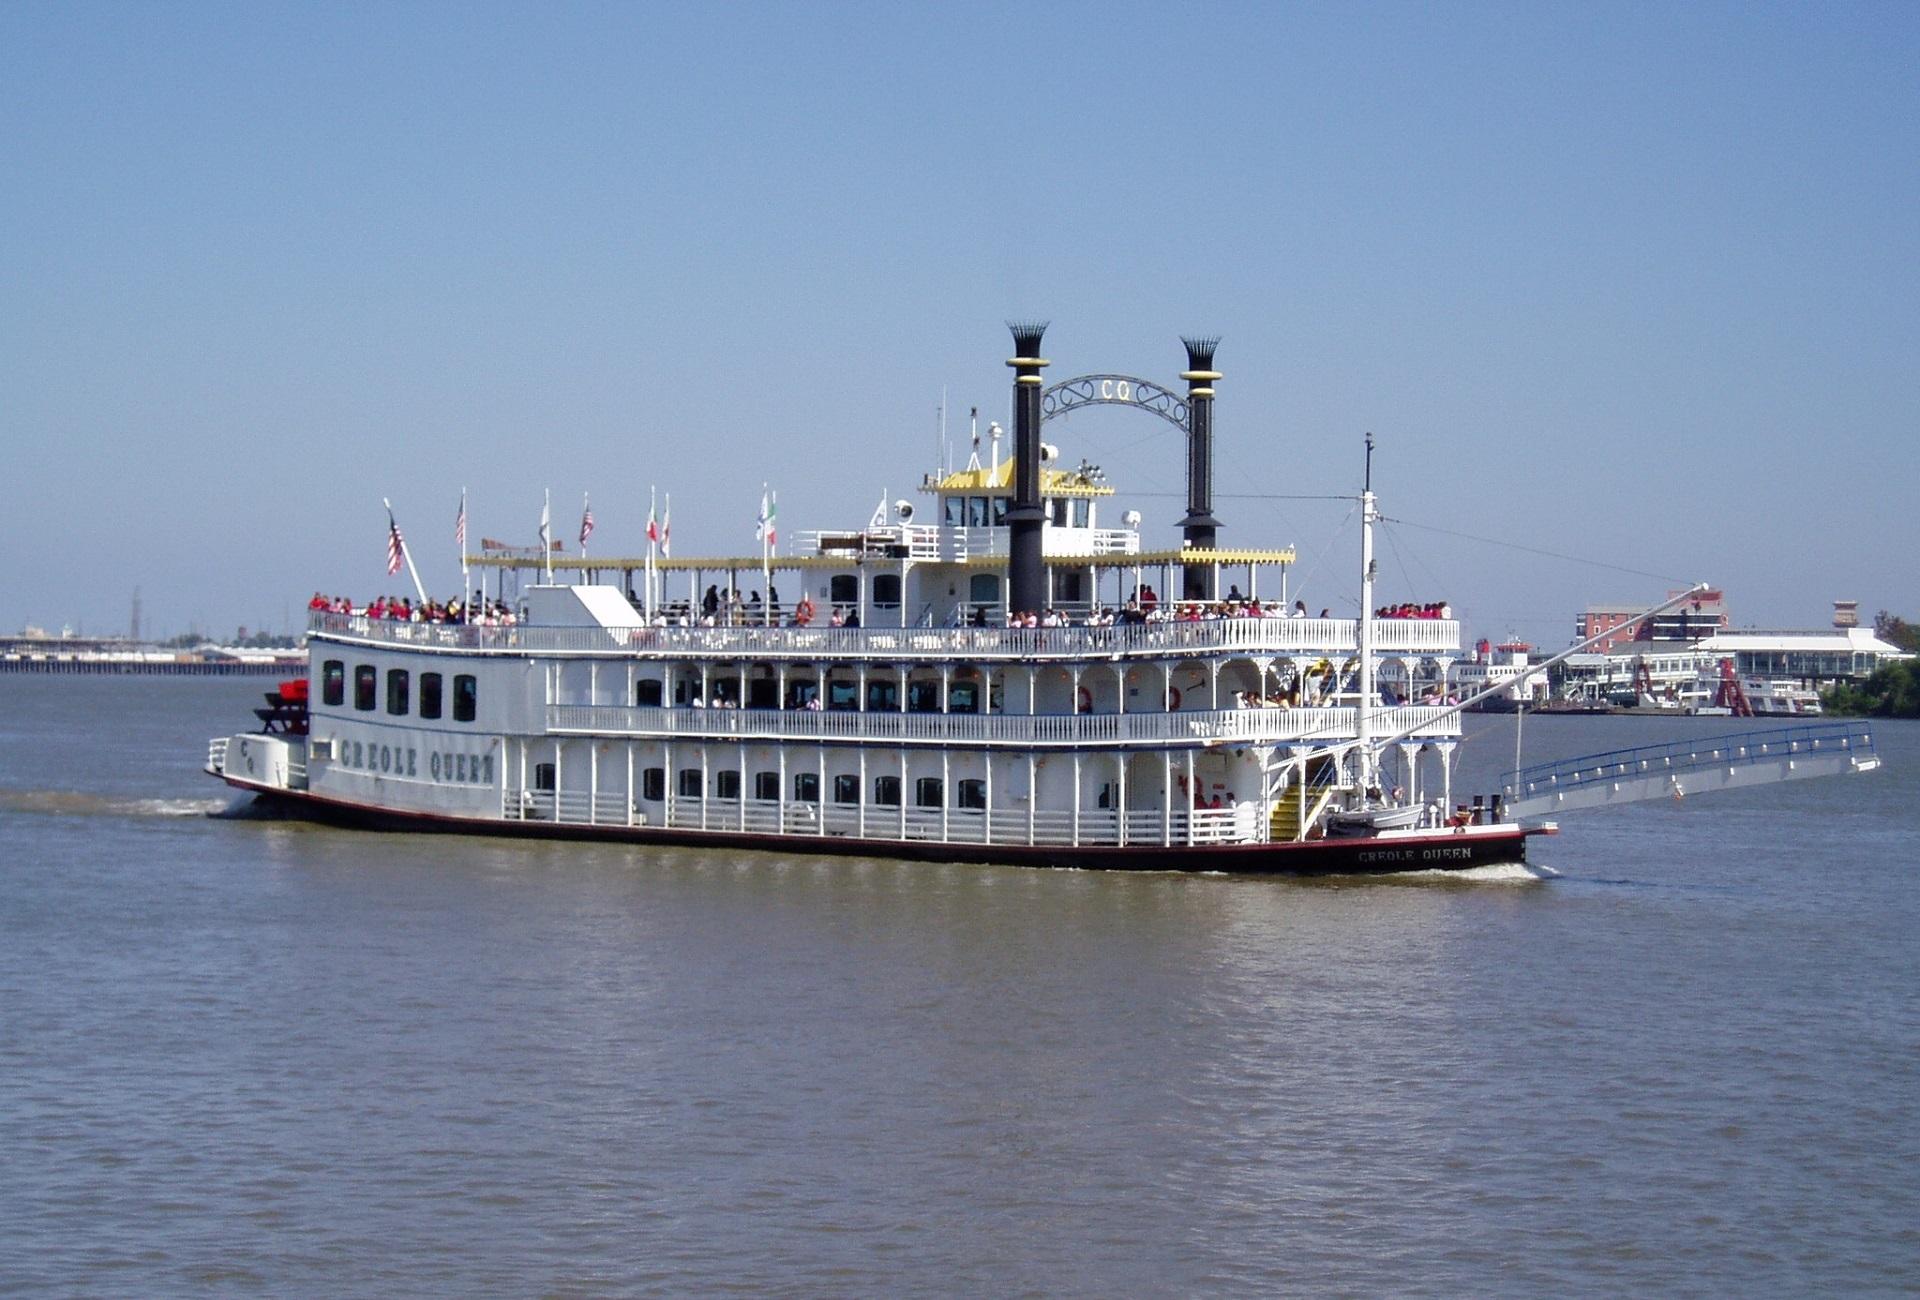 River boat photo